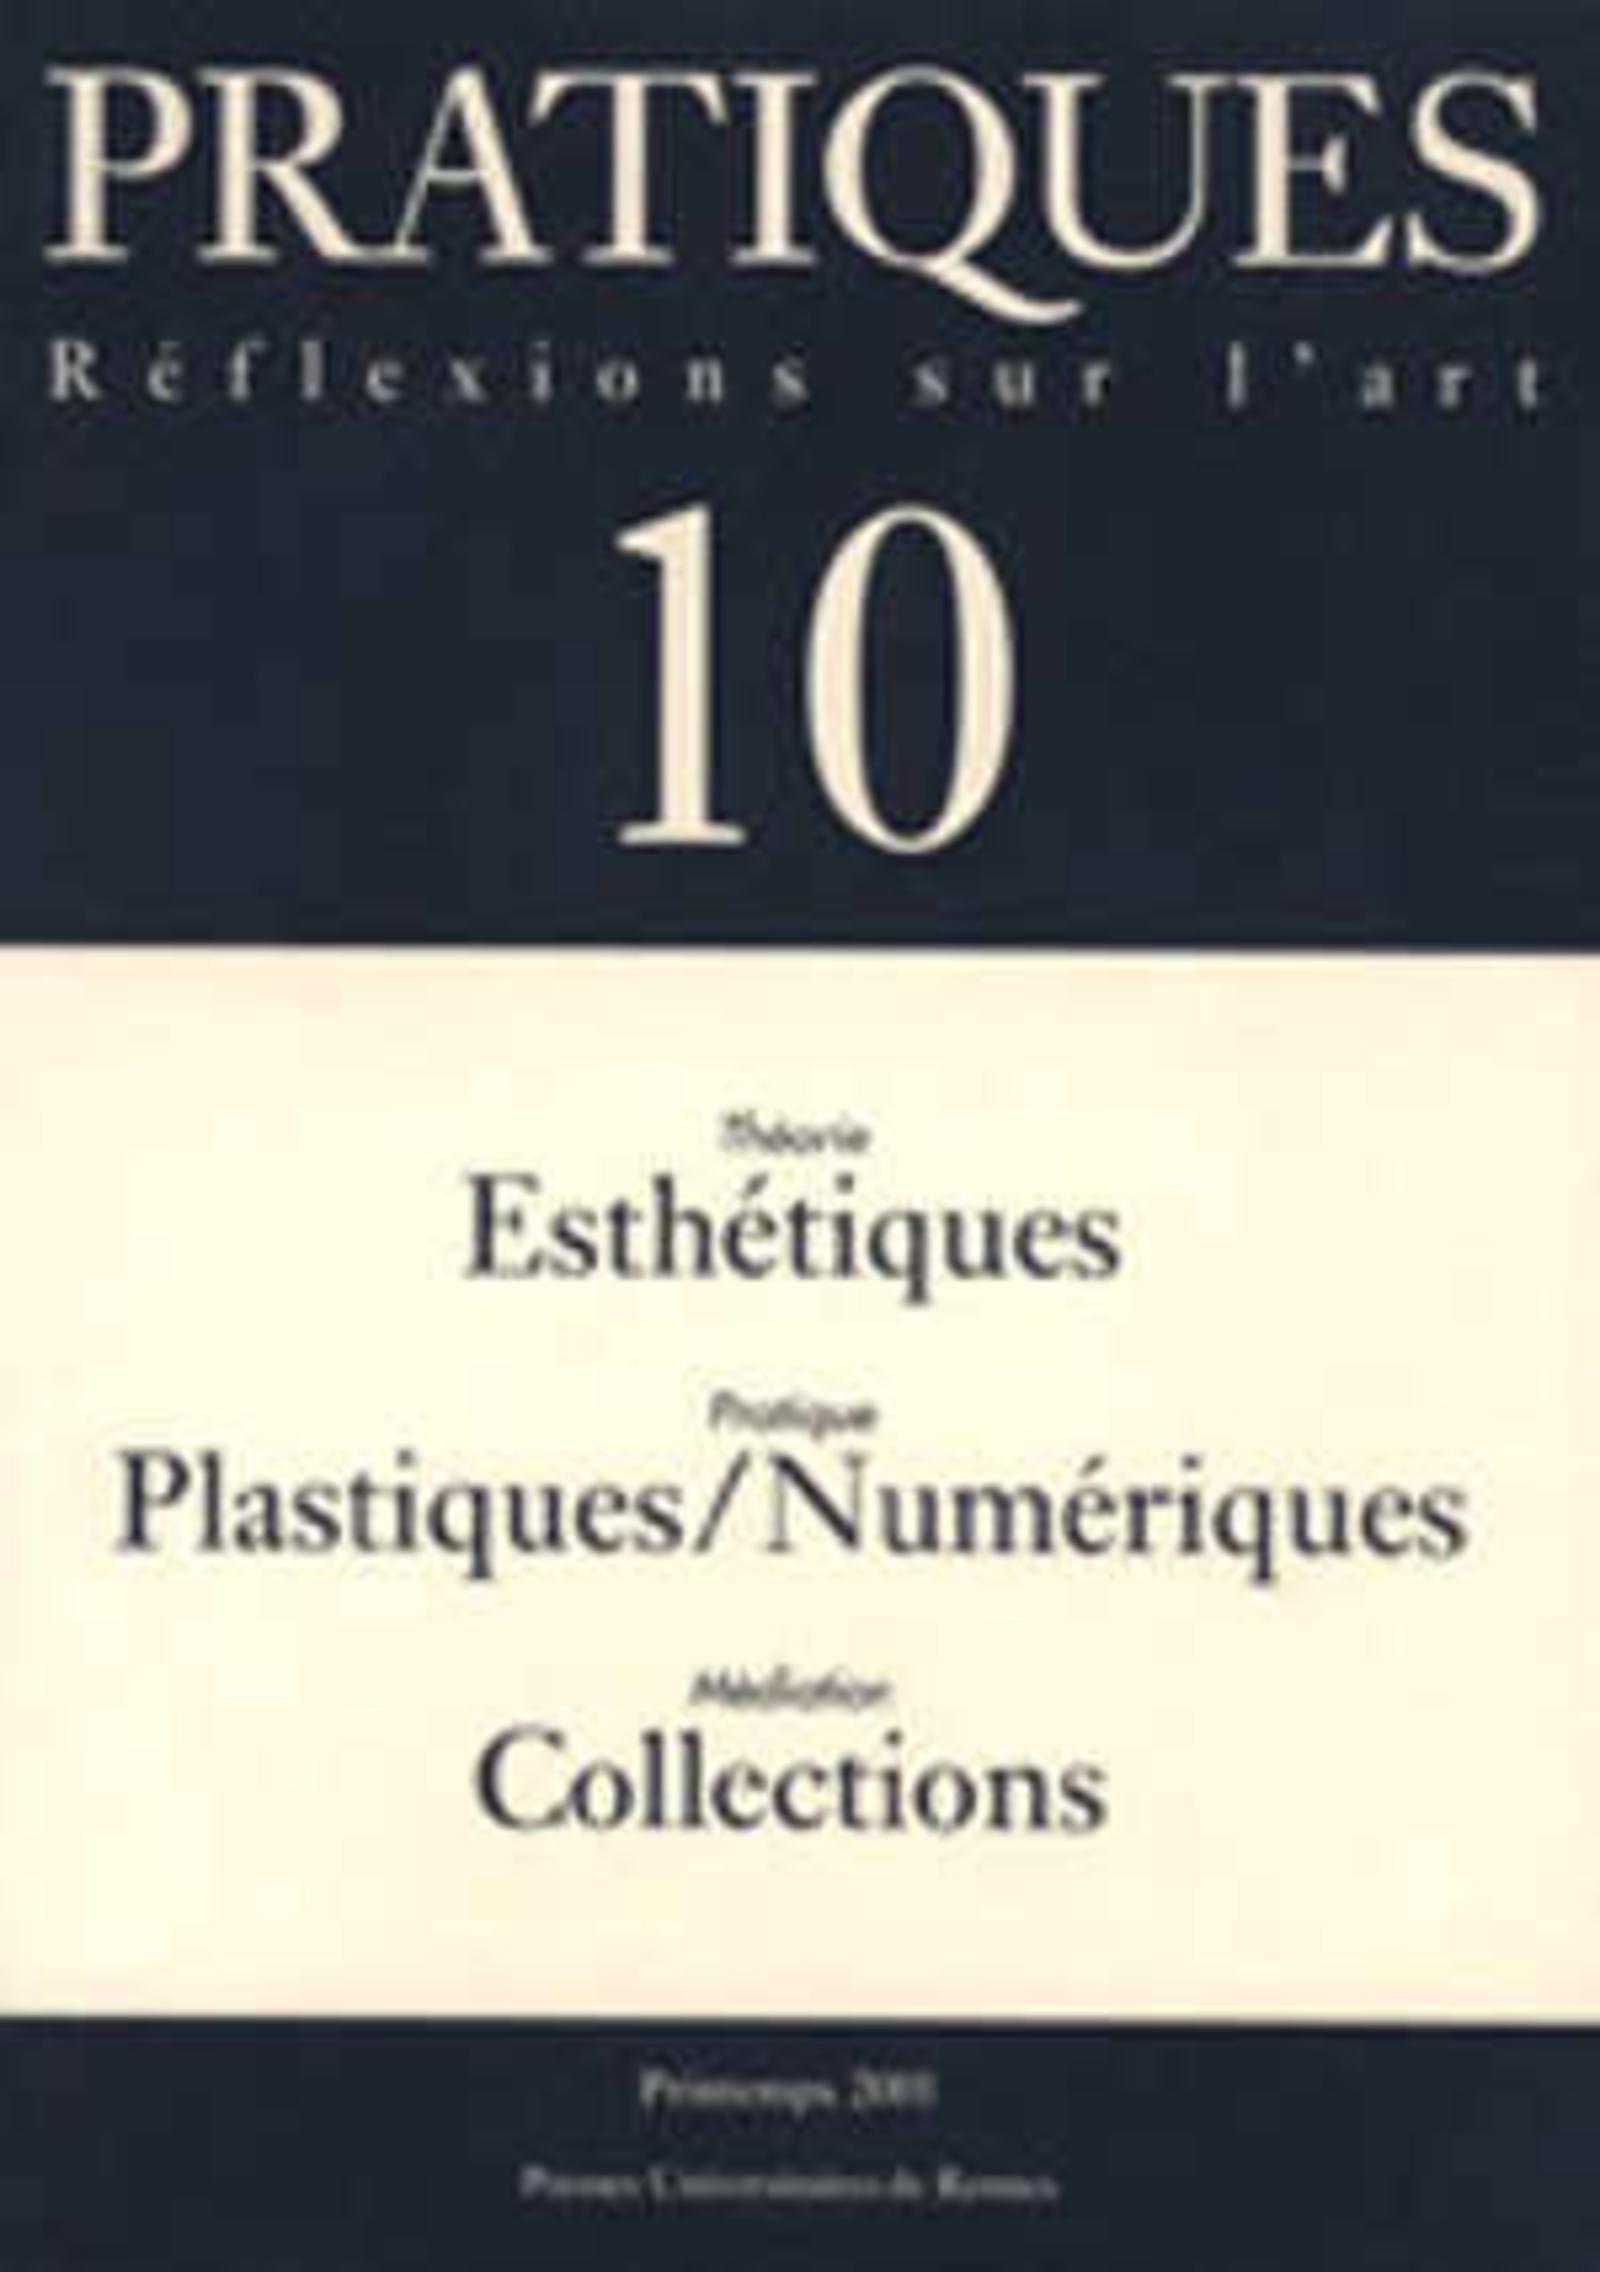 PRATIQUES 10